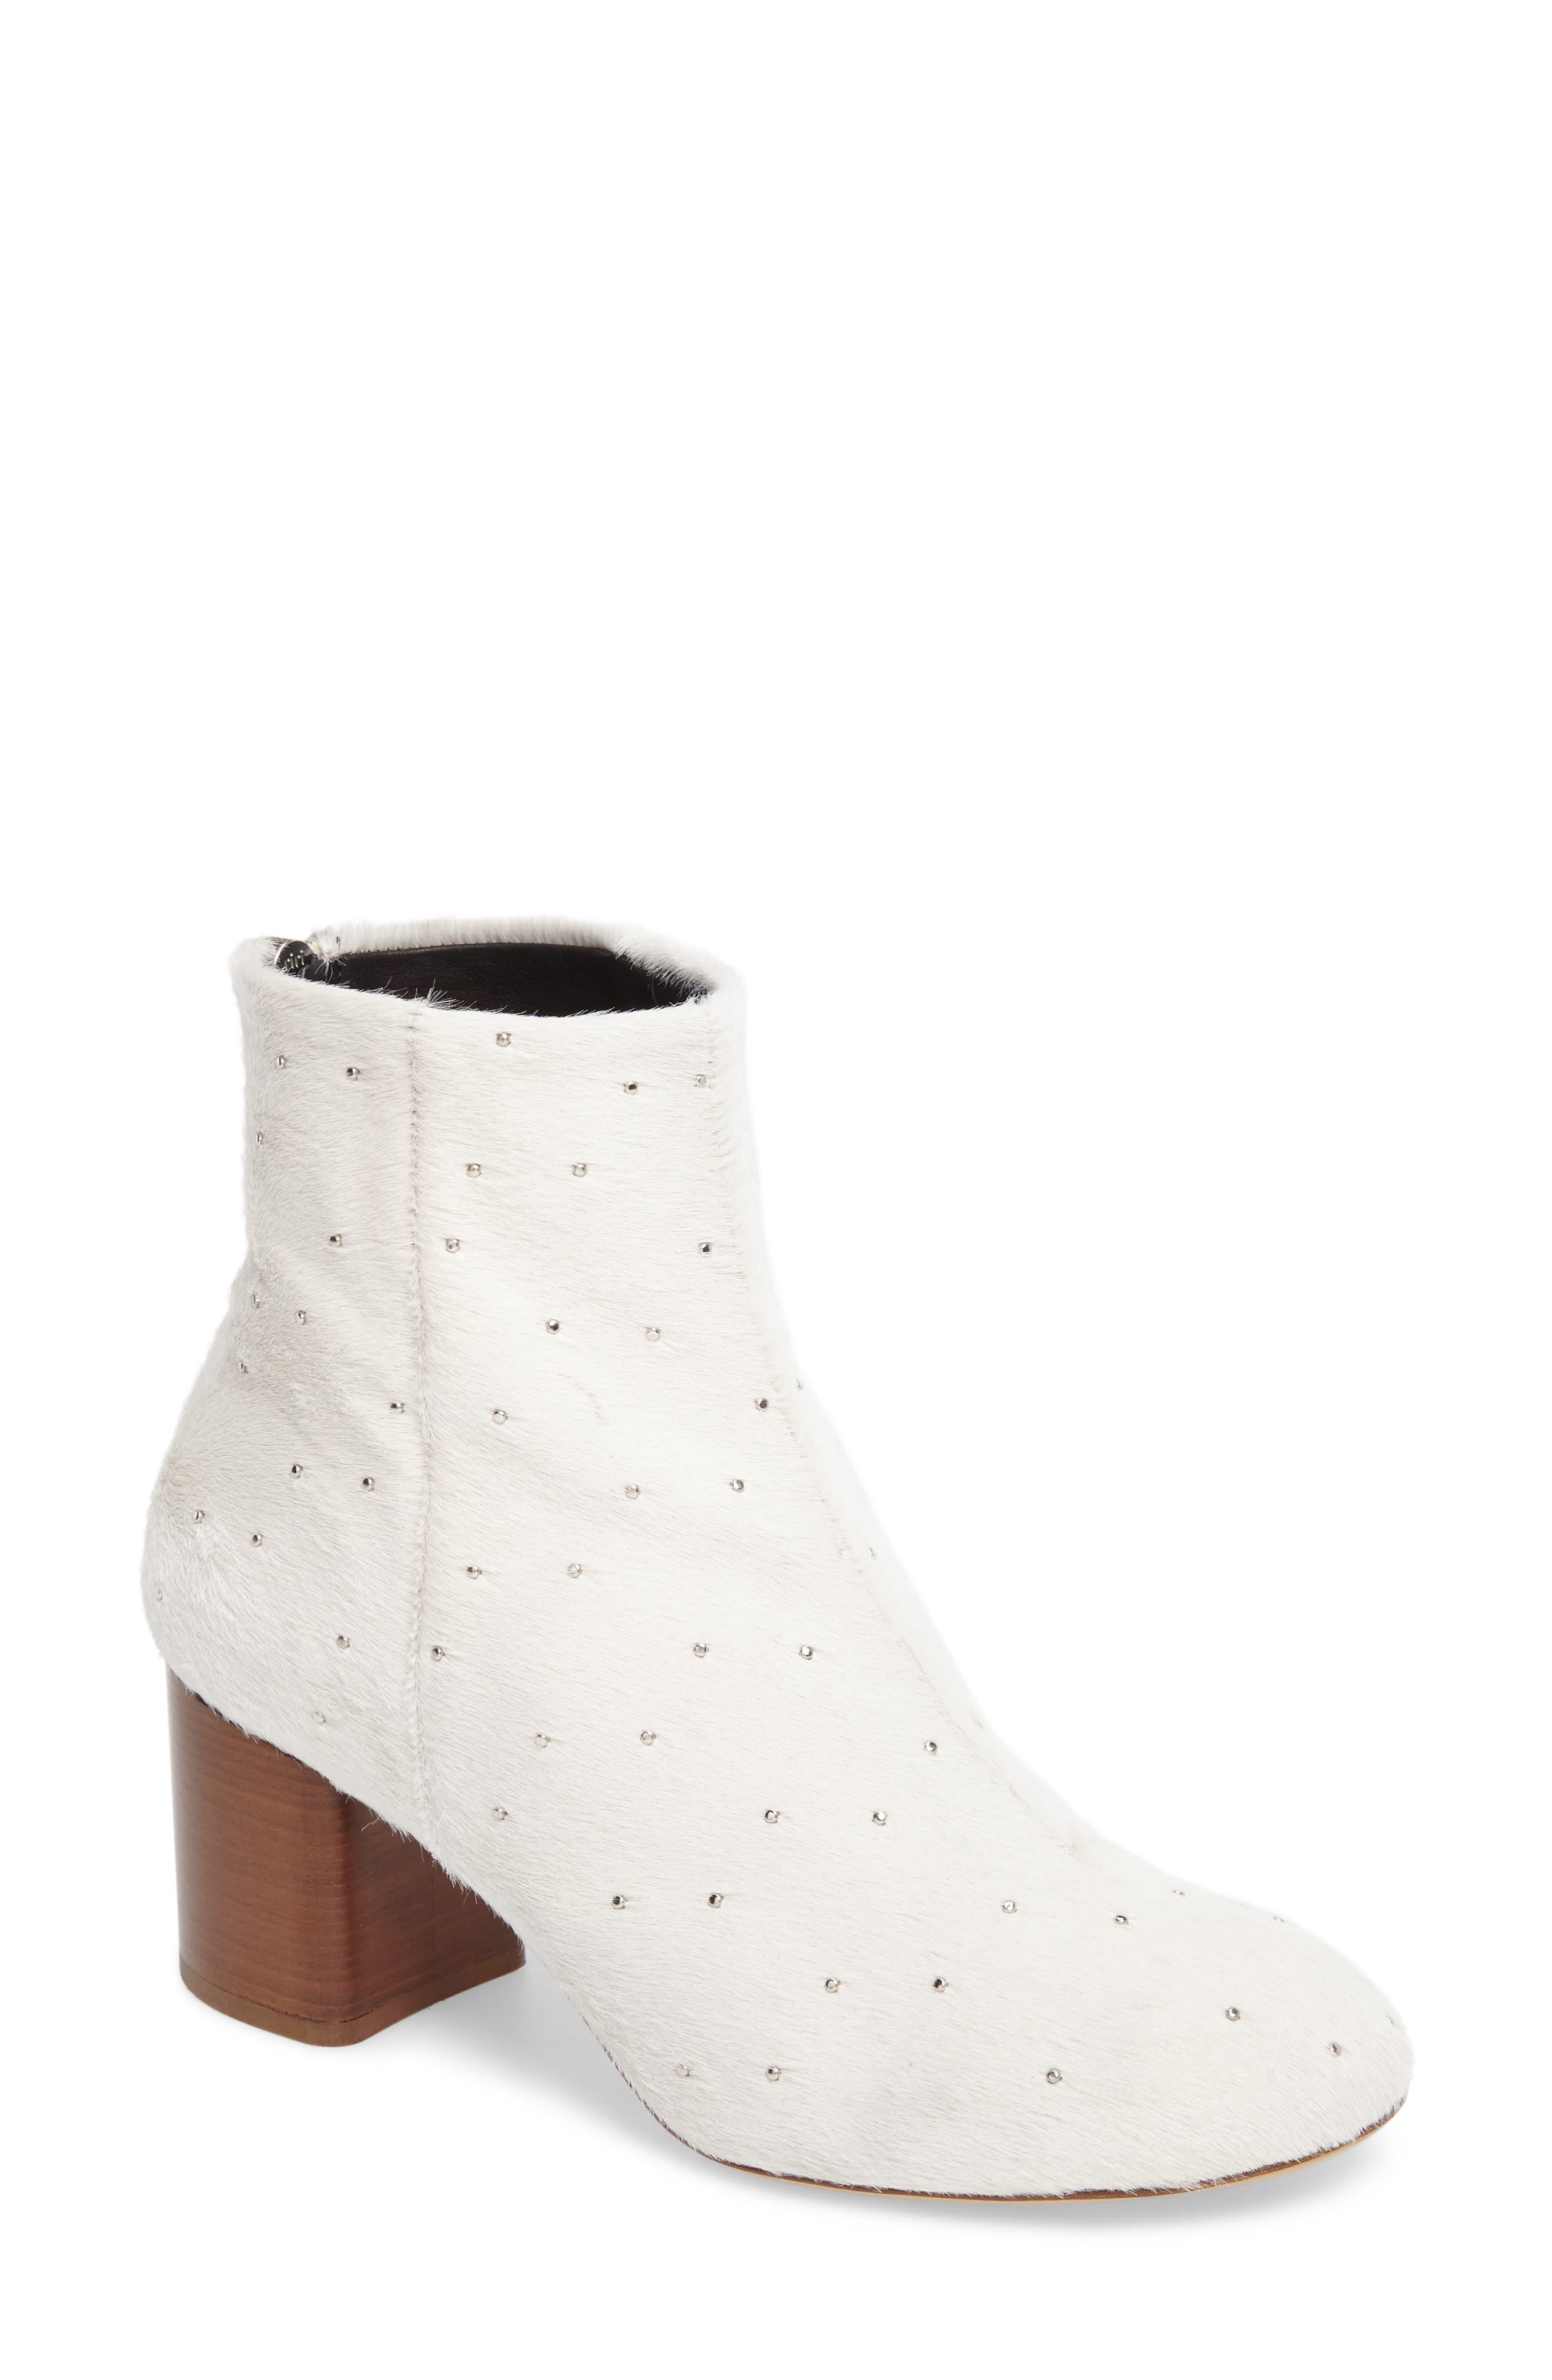 Alternate Image 1 Selected - rag & bone Drea Genuine Calf Hair Block Heel Bootie (Women)